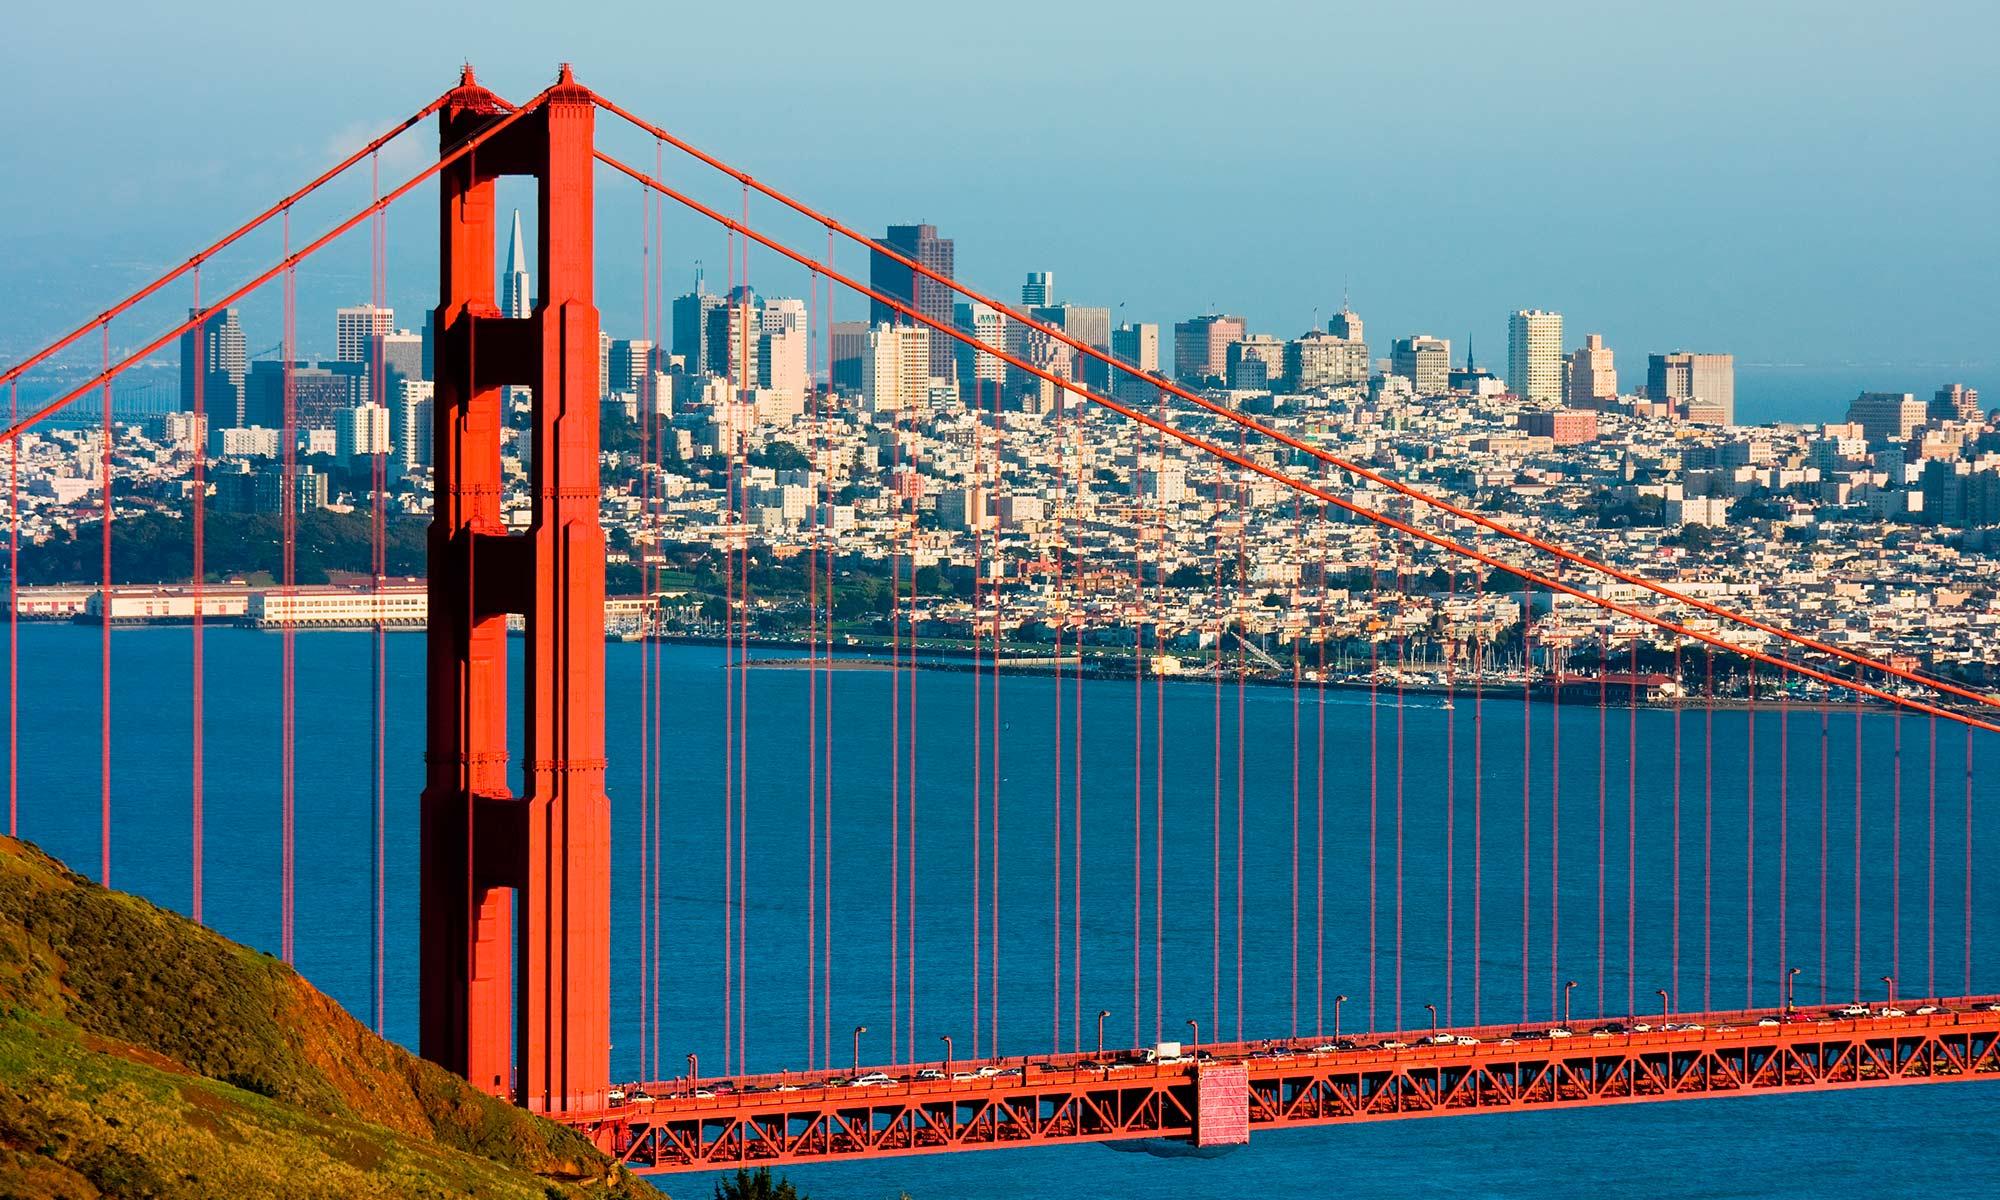 2ea4ebd8db4 Reisetips: 9 ting å gjøre i San Francisco • Blogg - USATours NO